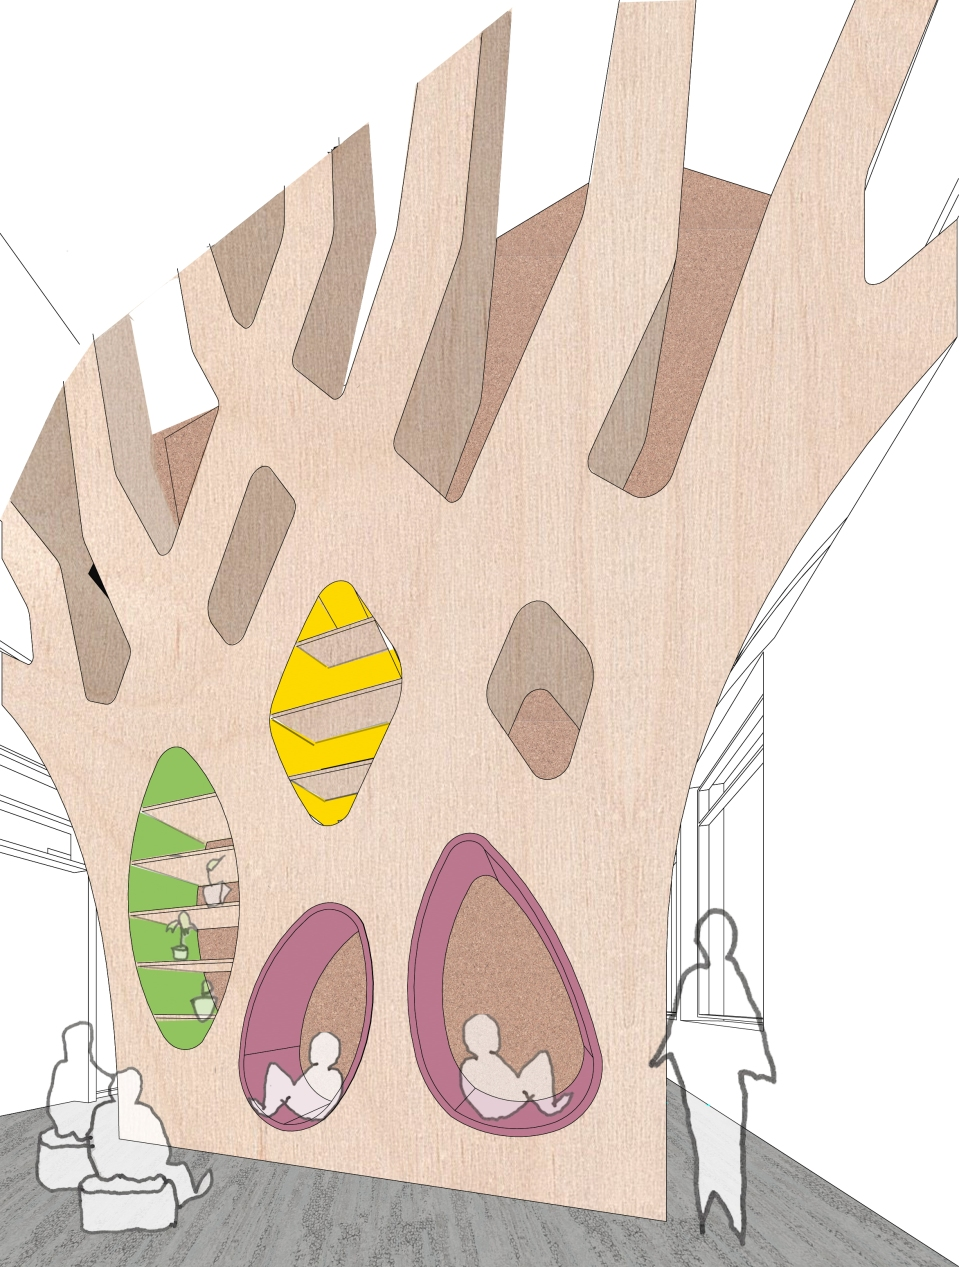 C:UsersUserDocumentsMaldon PS Design Development - 3D View -